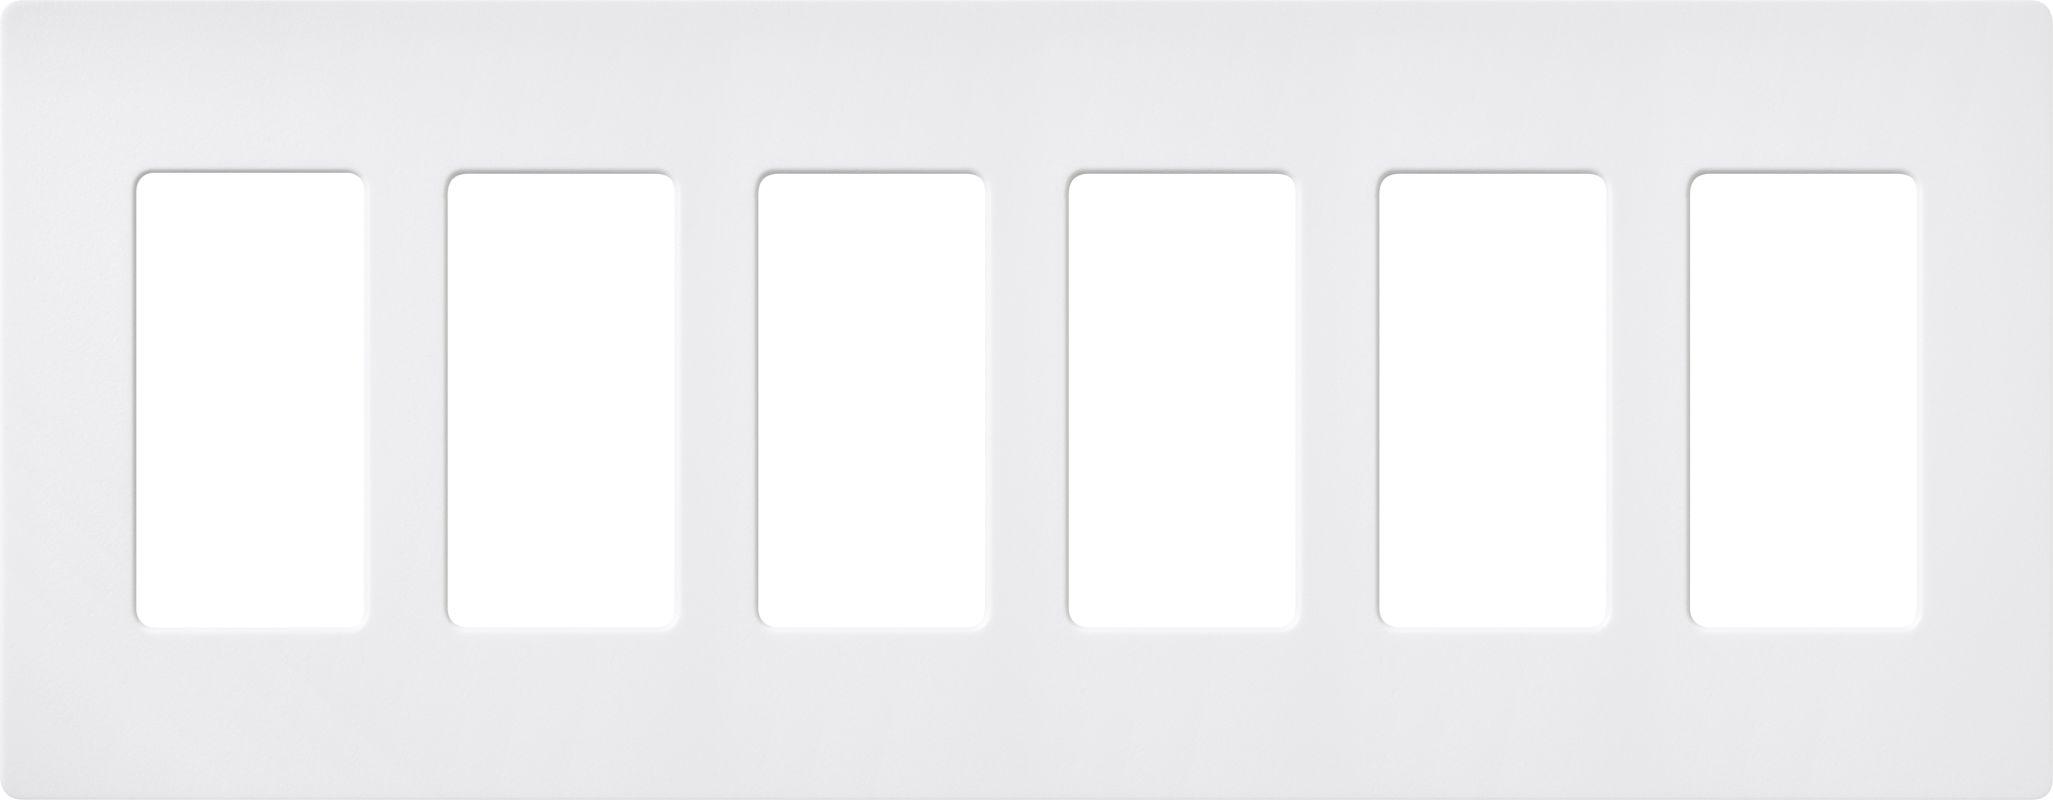 Lutron CW-6 Claro Six Gang Designer Wall Plate Snow Wall Controls Sale $59.75 ITEM: bci1856046 ID#:SC-6-SW UPC: 27557494854 :